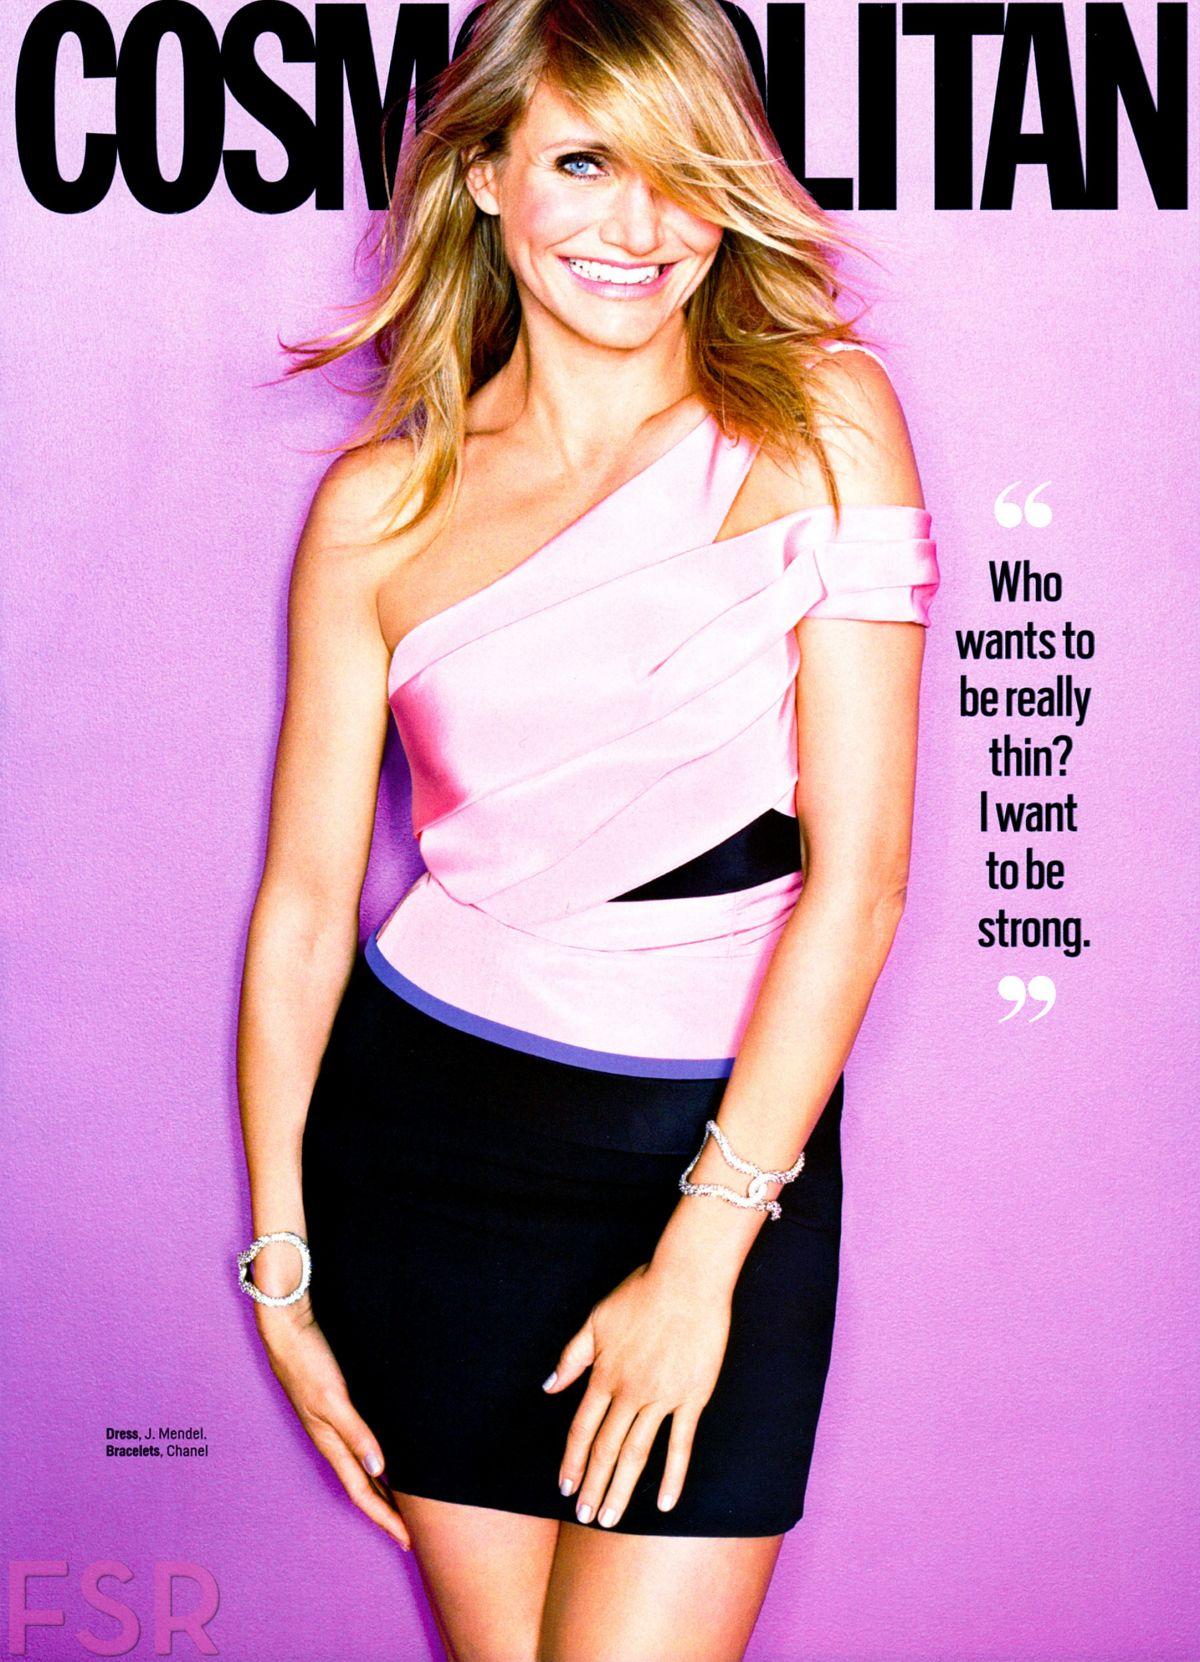 CAMERON DIAZ in Cosmopolitan Magazine, January 2015